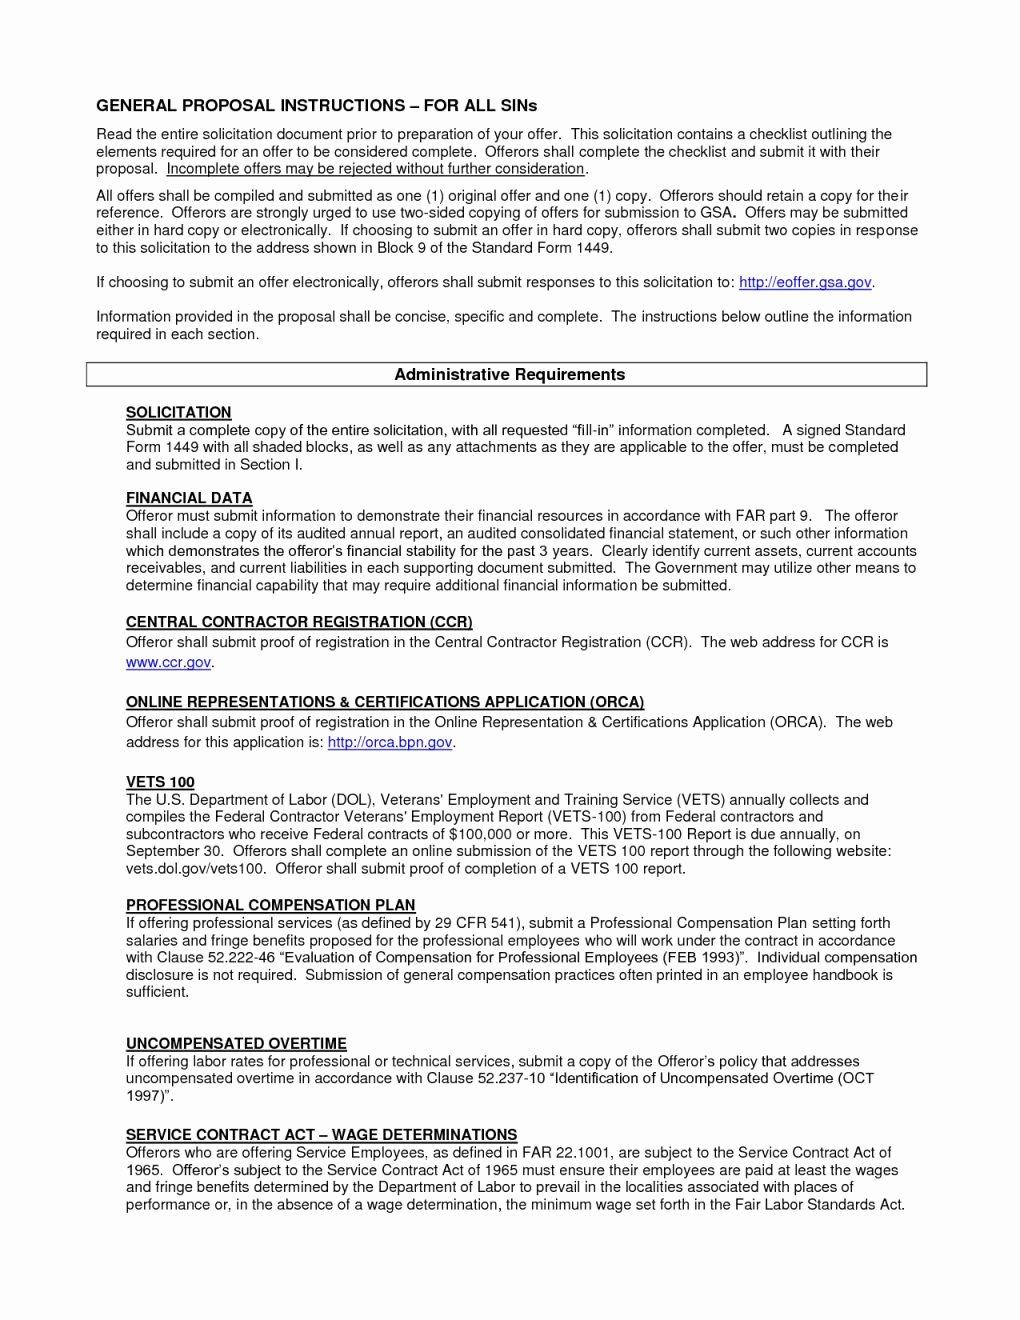 Preferred Professional Employee Pensation Plan Template